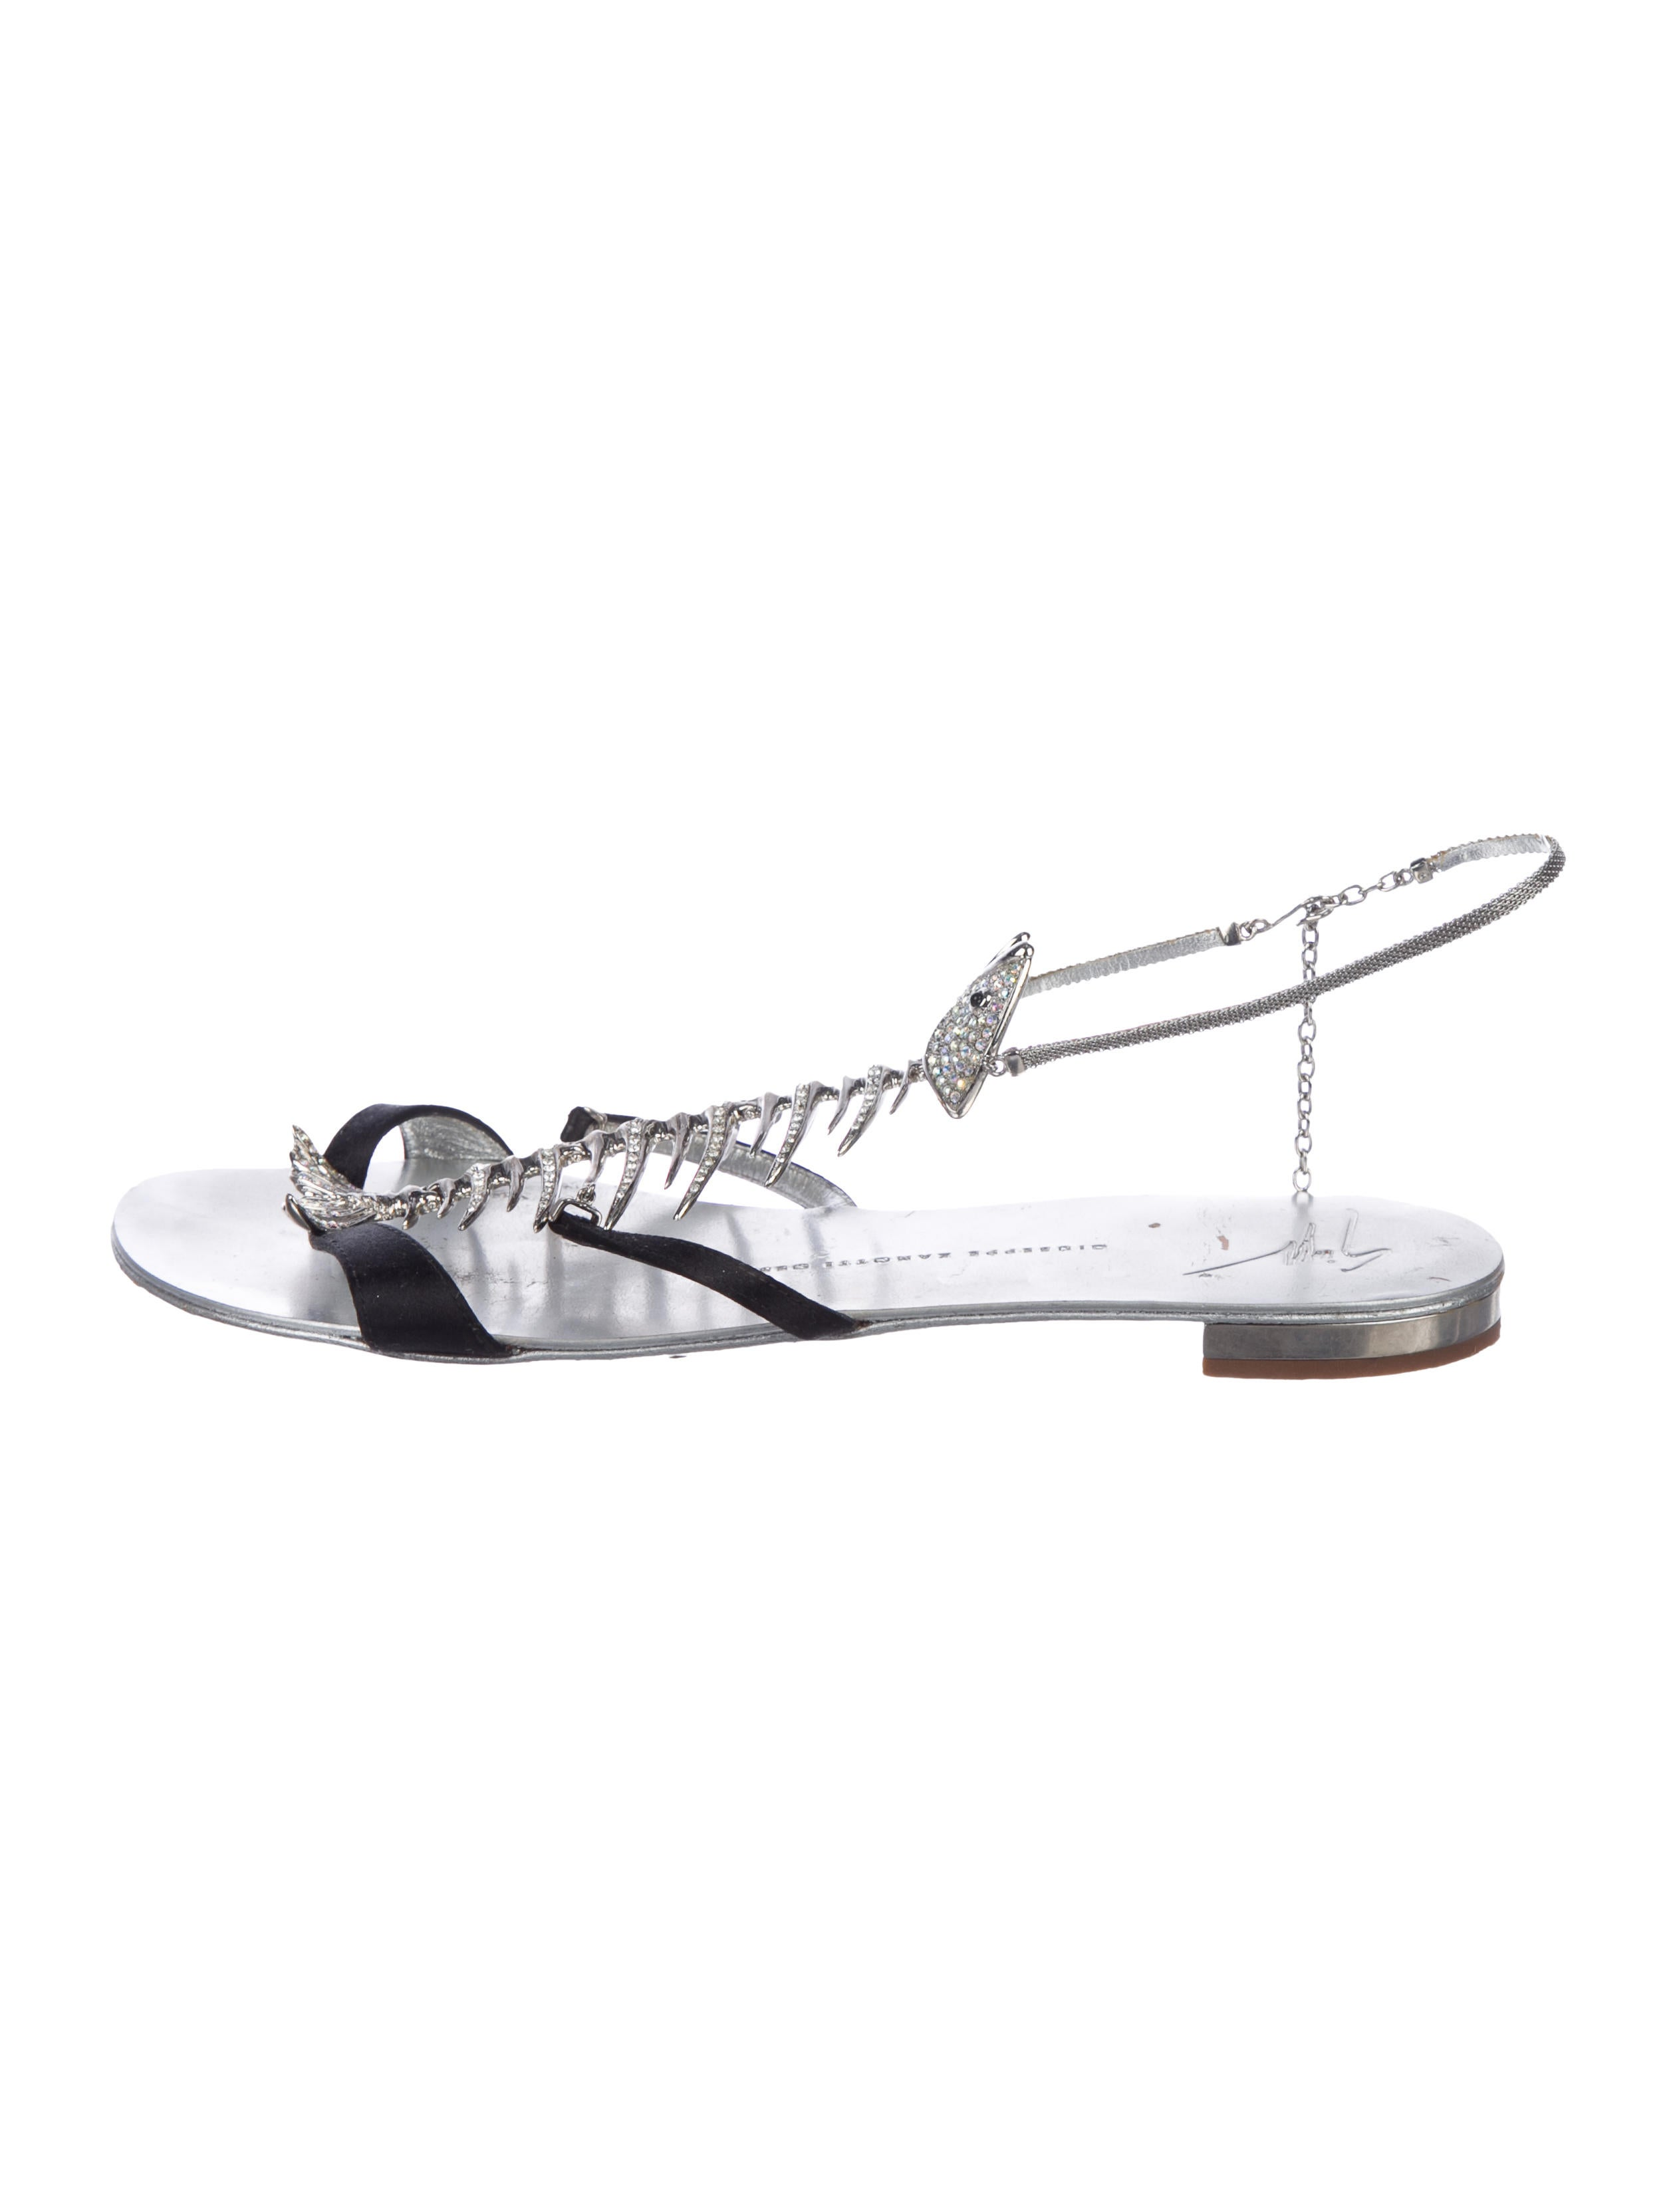 341a11c7a89b0 Giuseppe Zanotti Satin Fish Bone Sandals - Shoes - GIU48090 | The ...